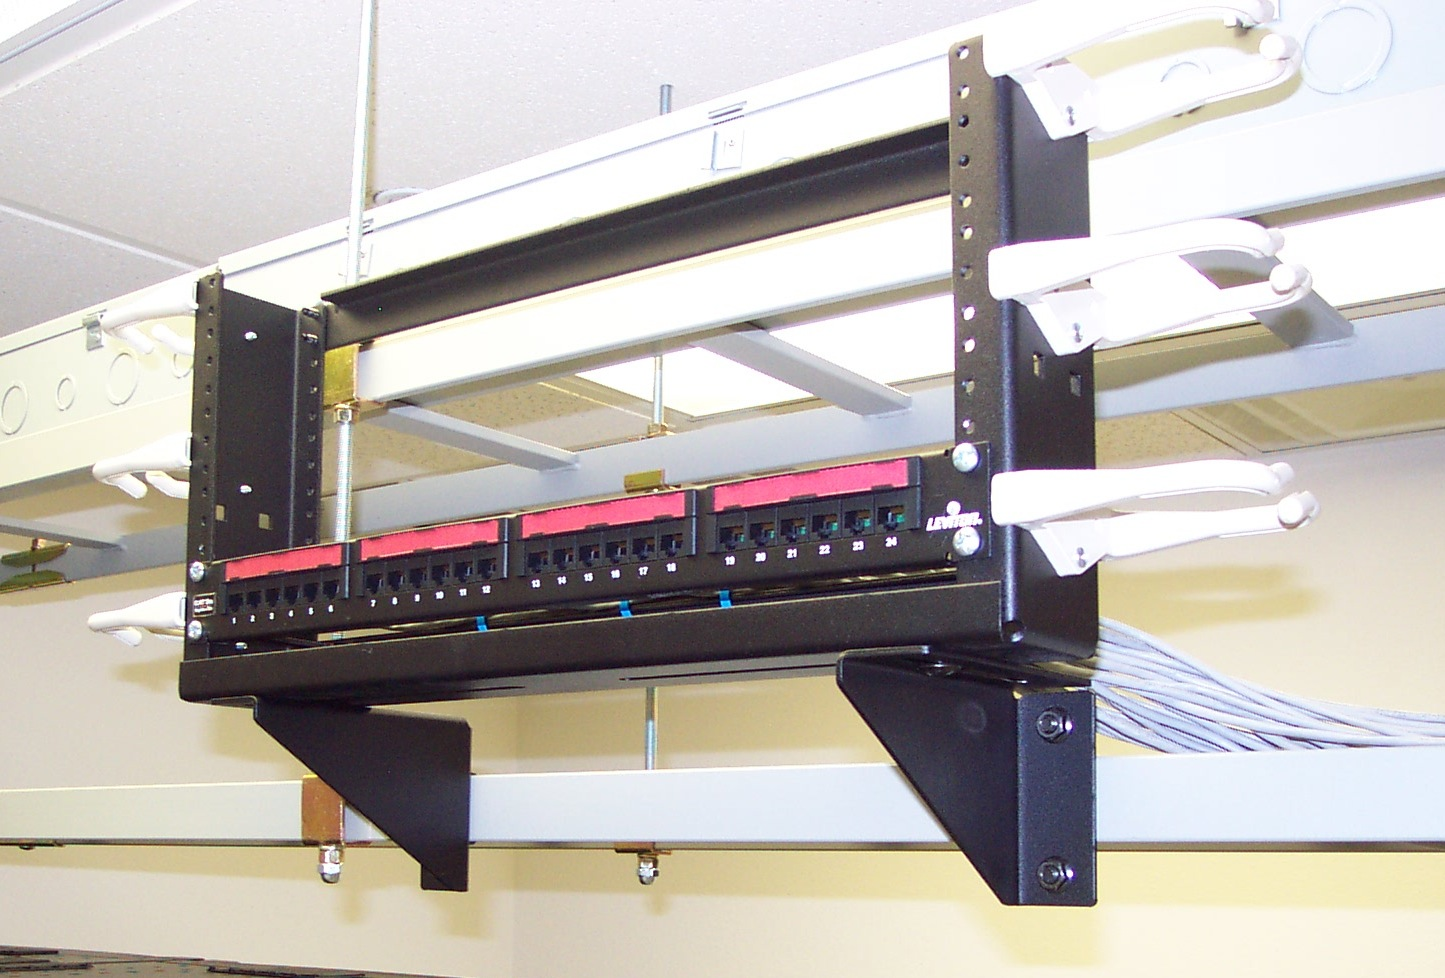 New Facility Progress 8 Roller Network Newspipe